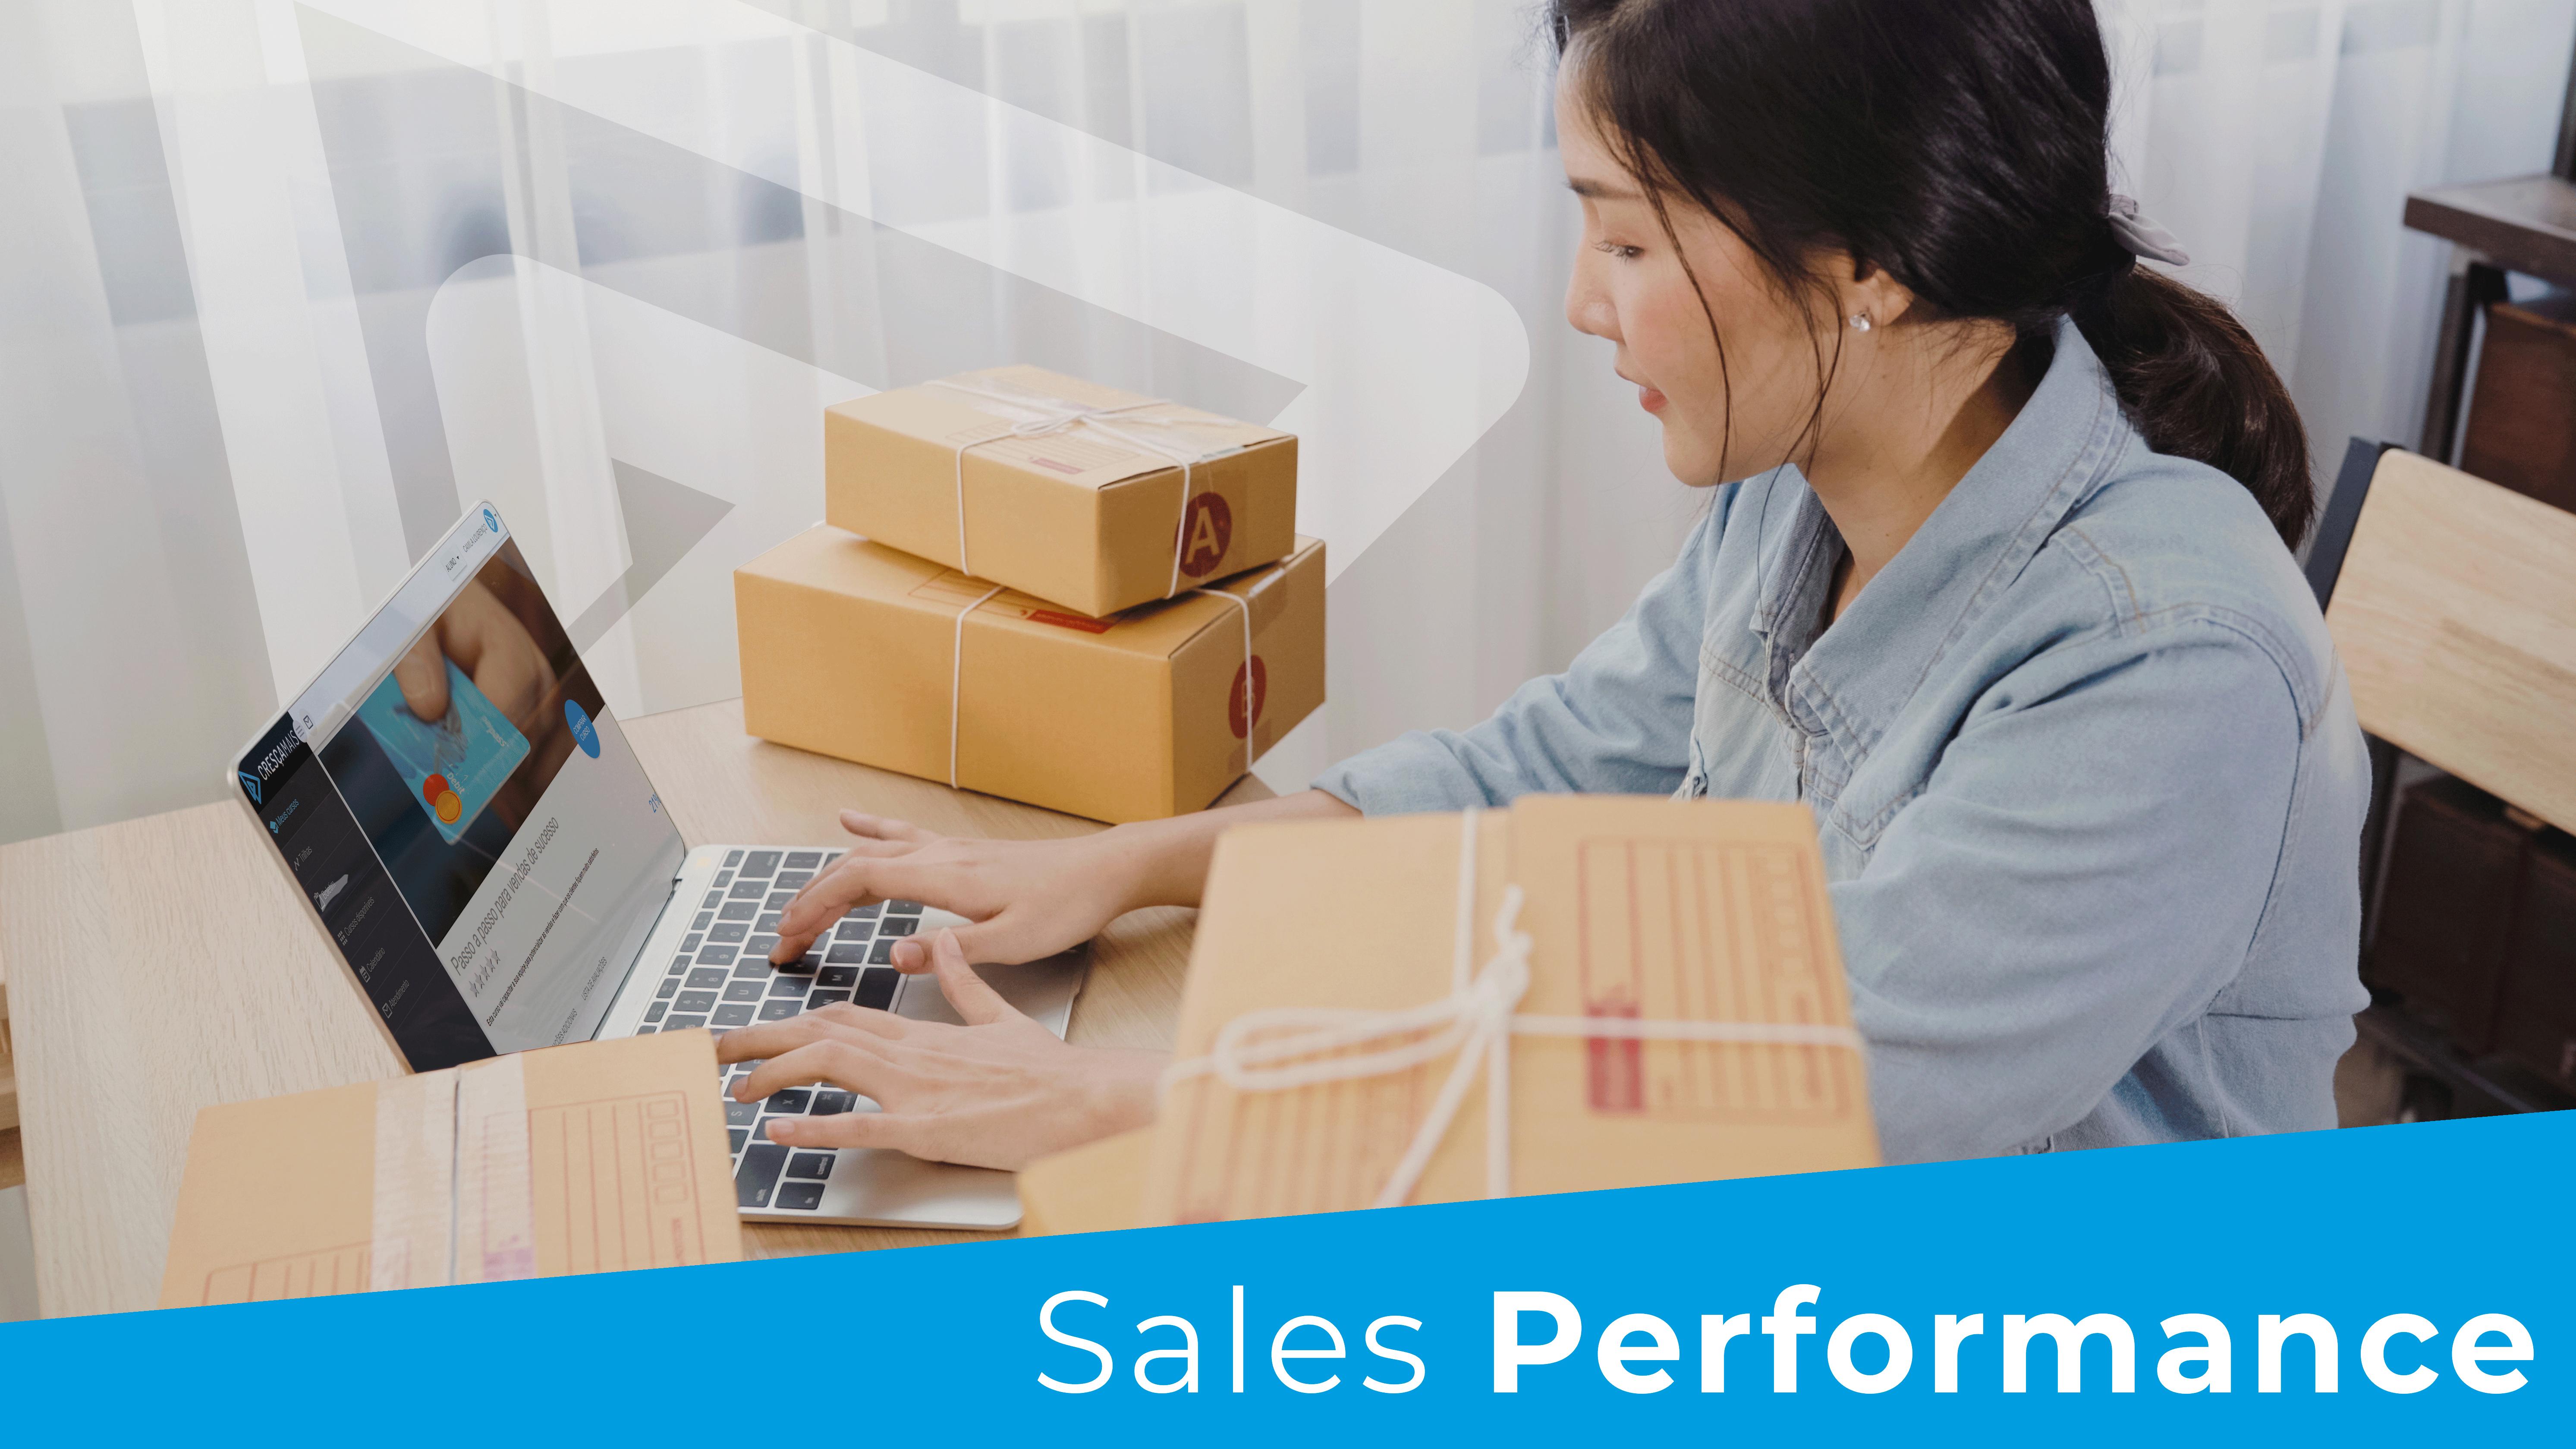 Sales performance 2